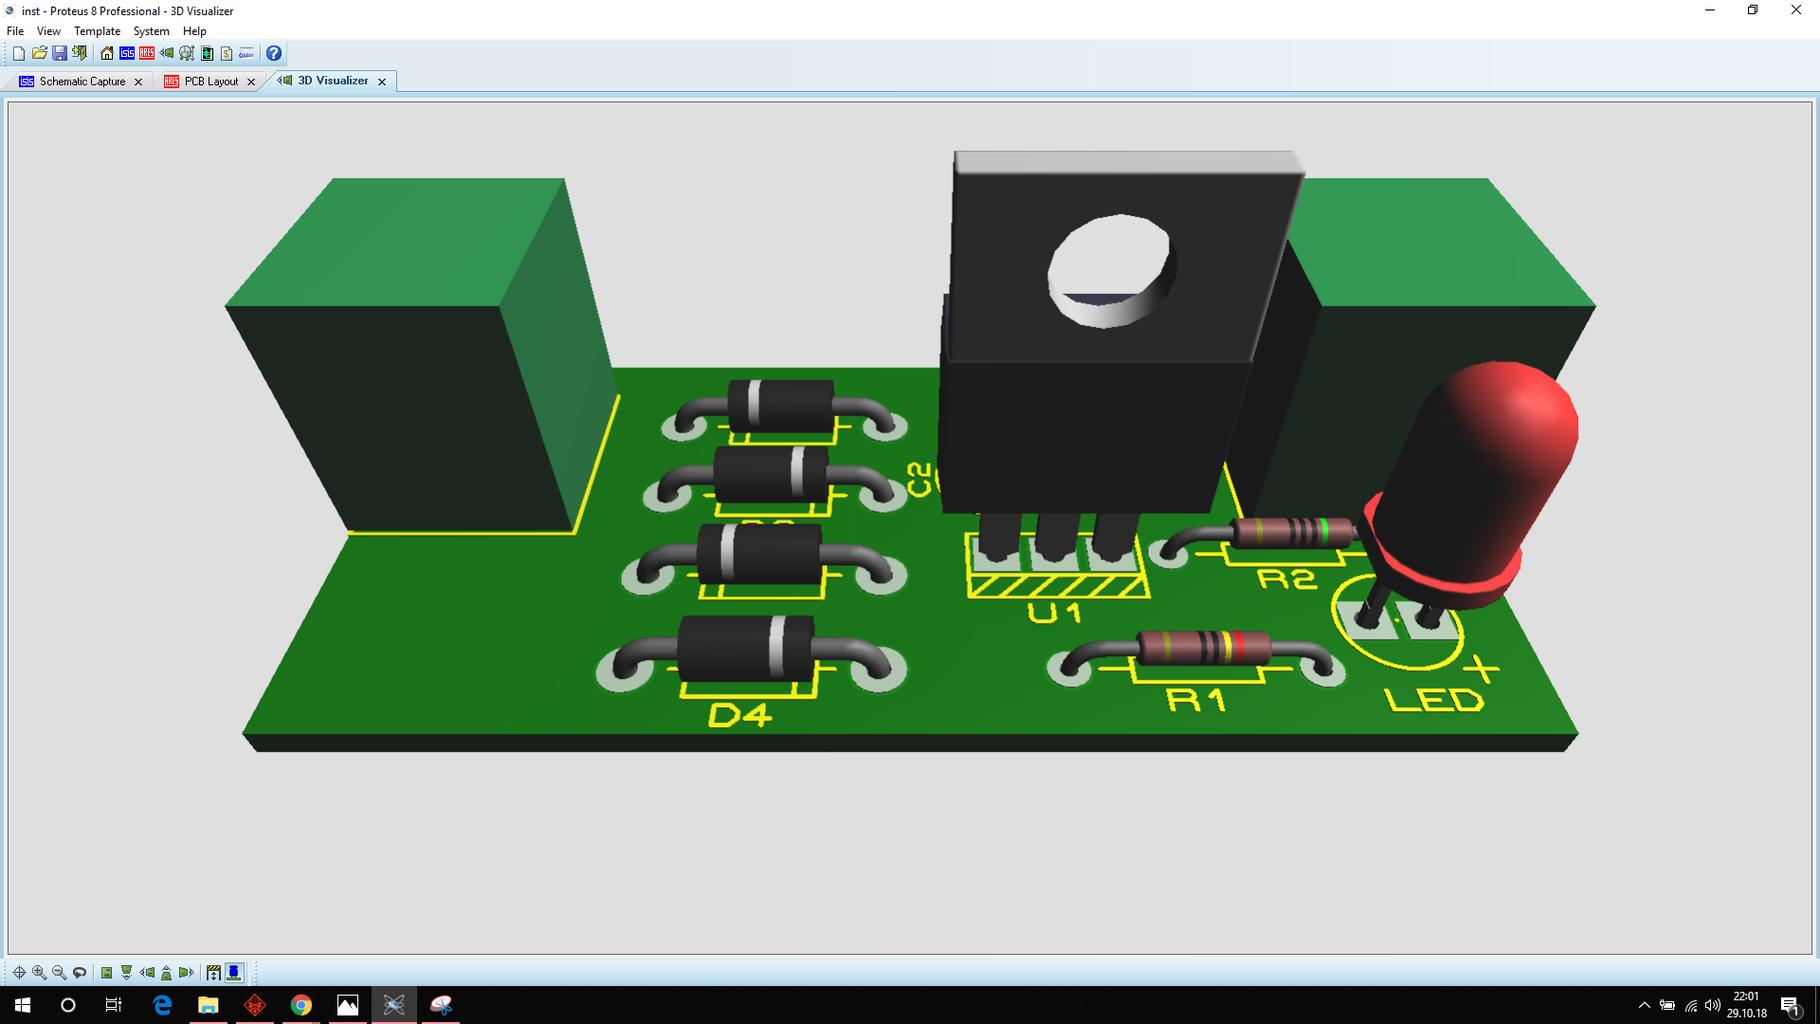 Simulating Designing of Circuits+PCB on Proteus